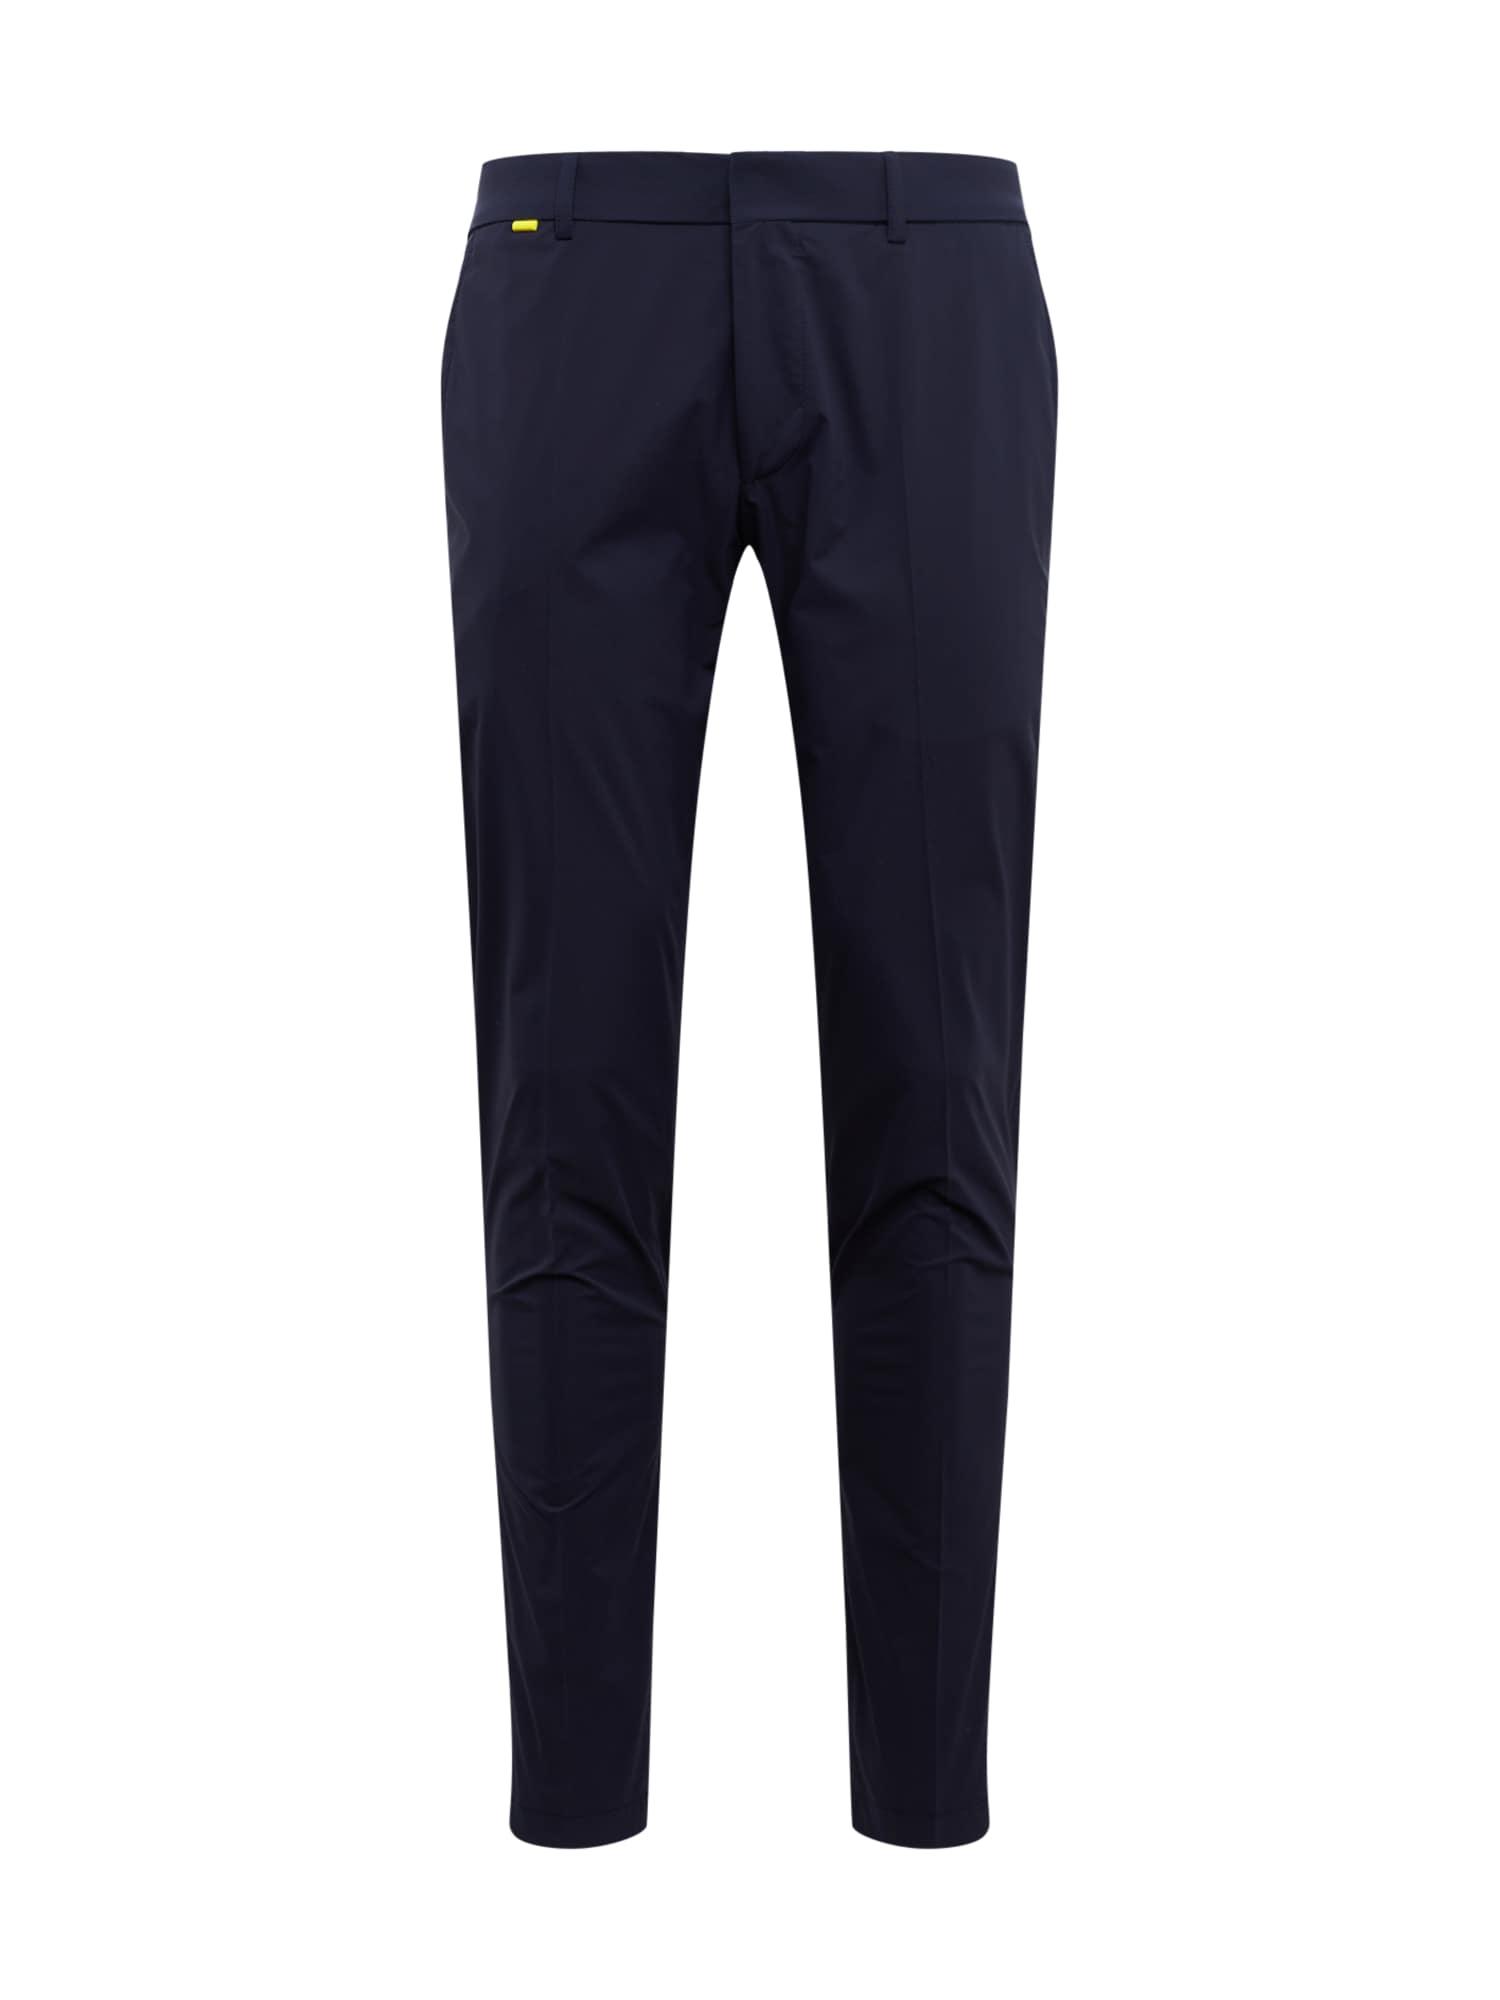 CINQUE Kelnės 'Cibrody' tamsiai mėlyna